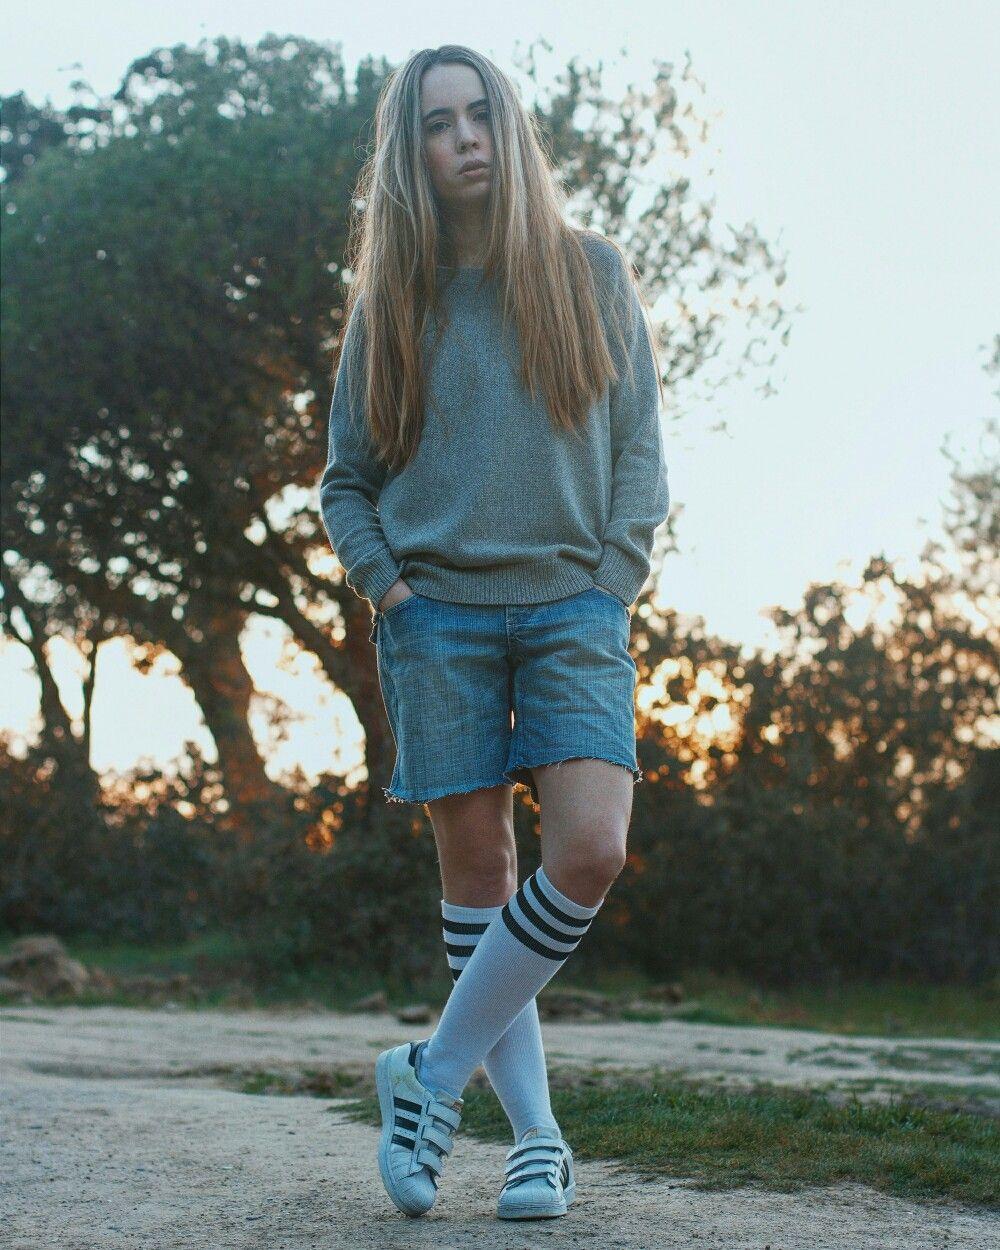 e0a7198377c Old School Knee High  American Socks  Barcelona. Tube alternative  streetwear.